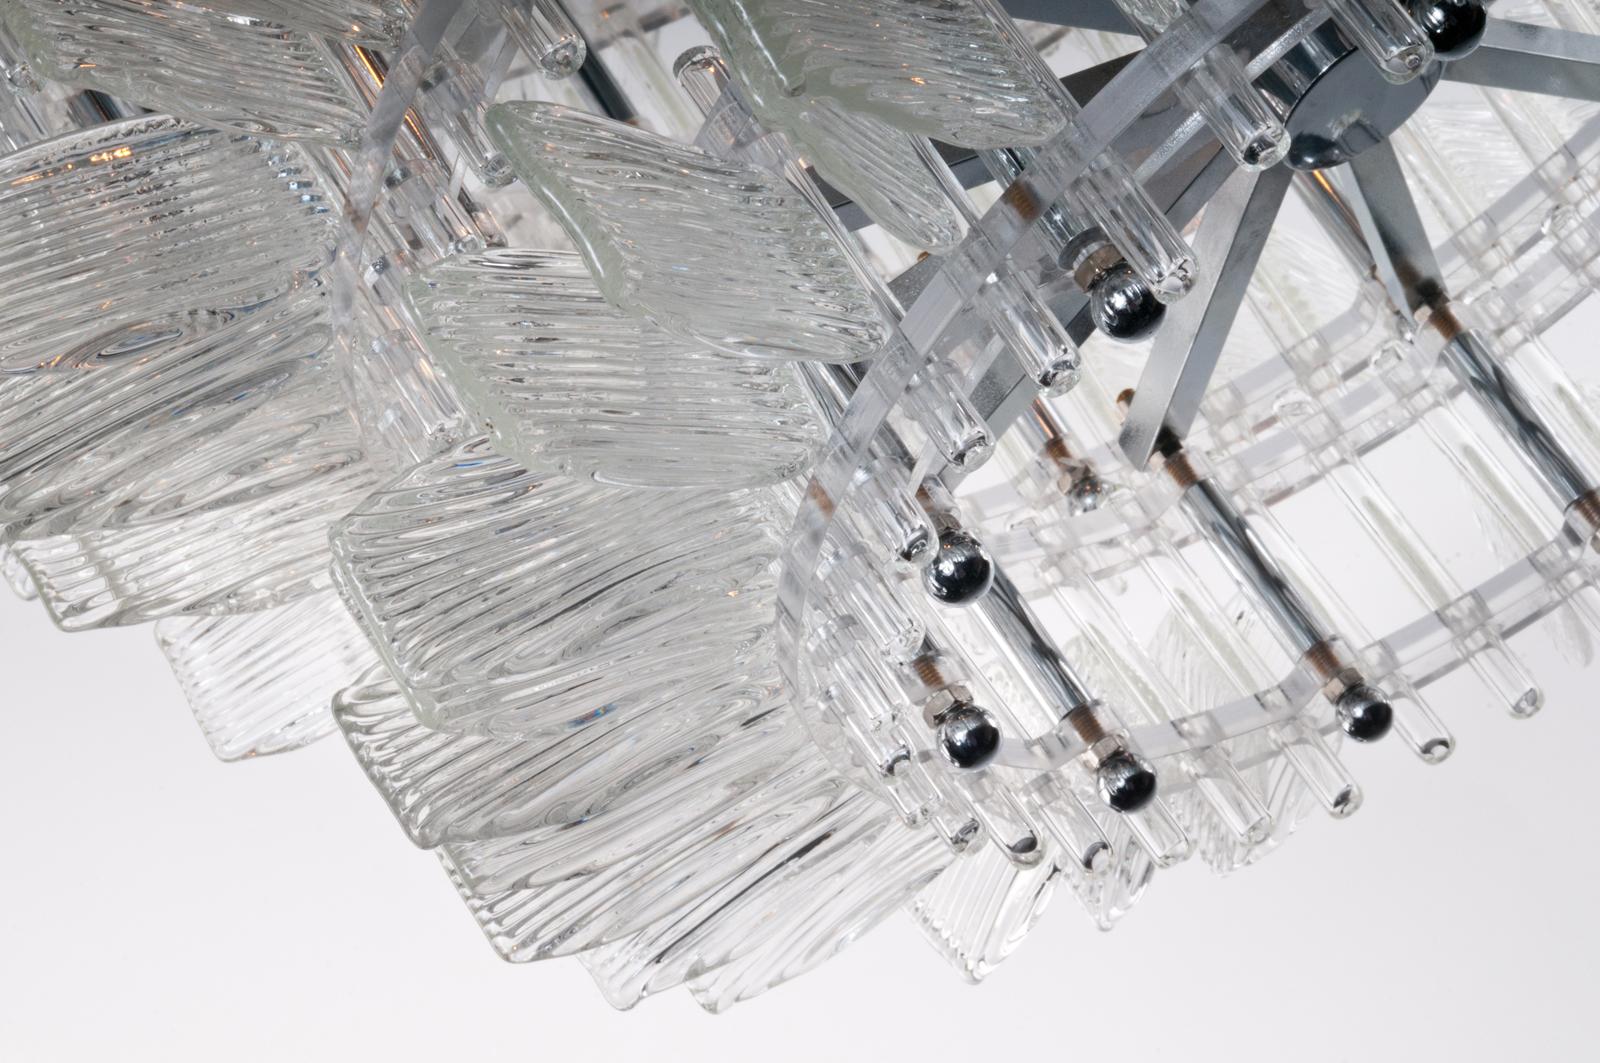 anemone-plafonnier-ceiling-veronese-tal-lancman-maurizio-galante-41.jpg